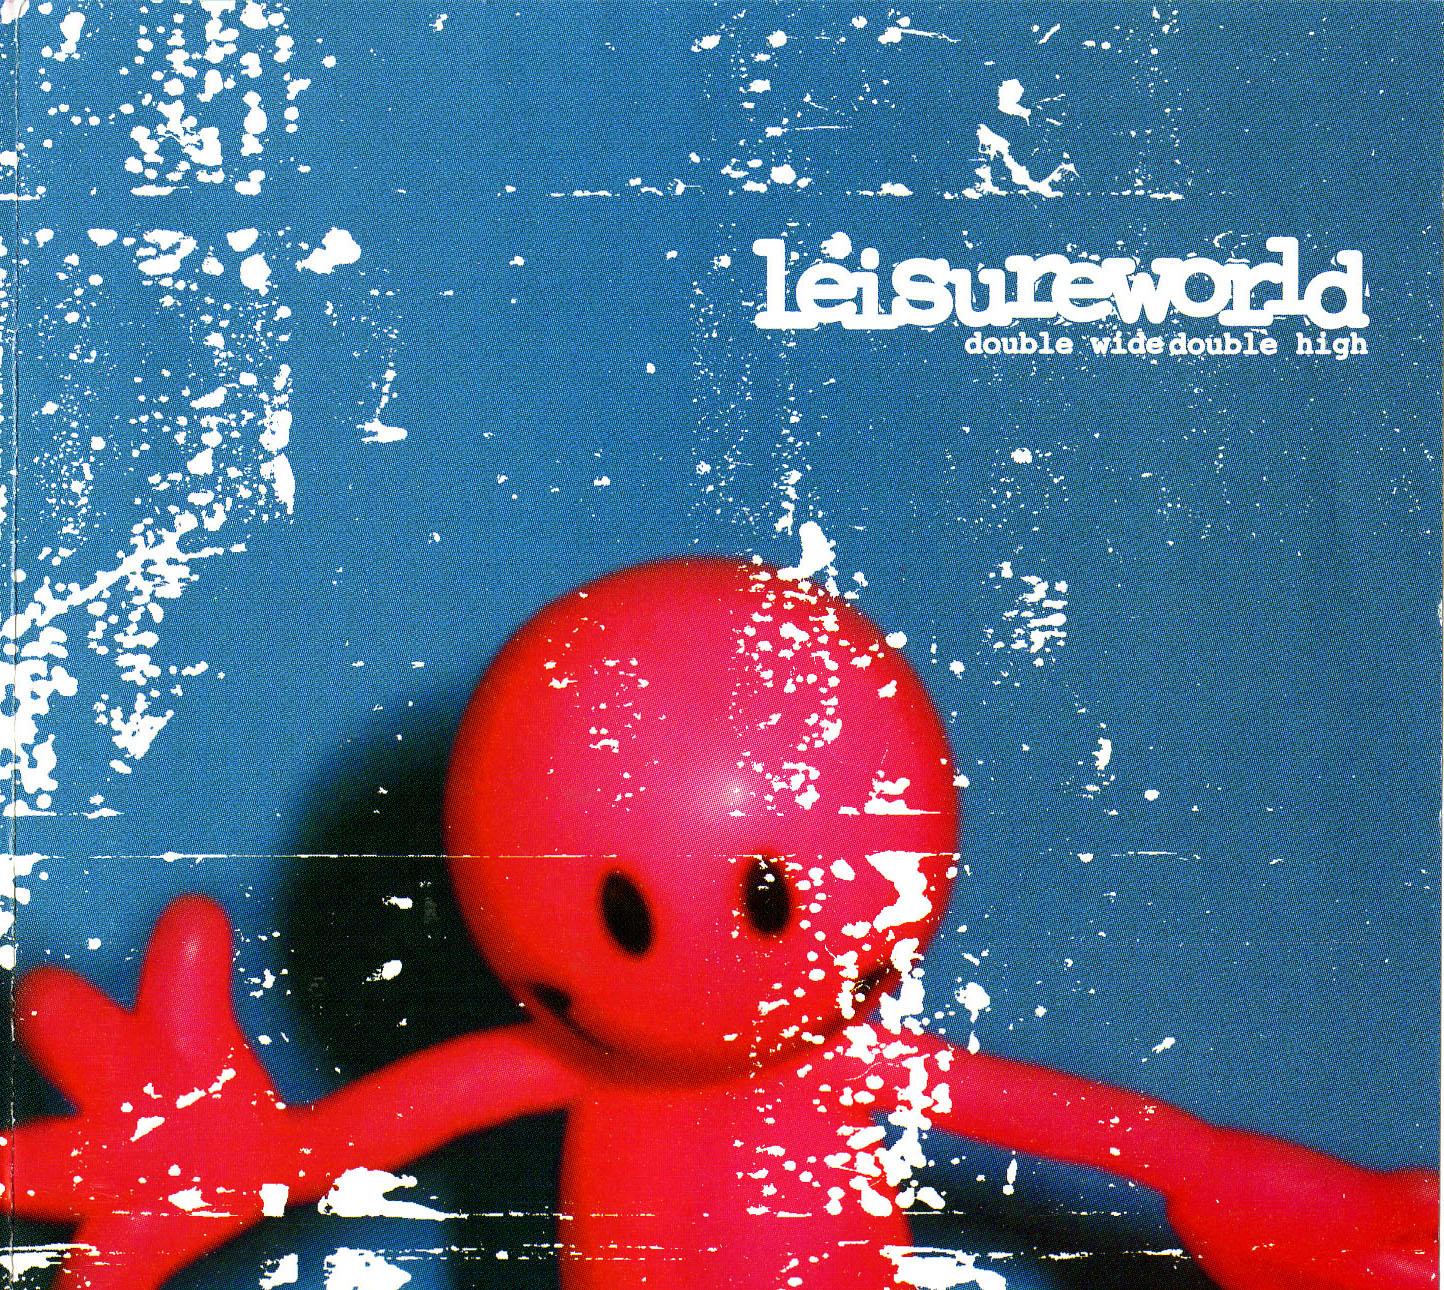 Leisureworld